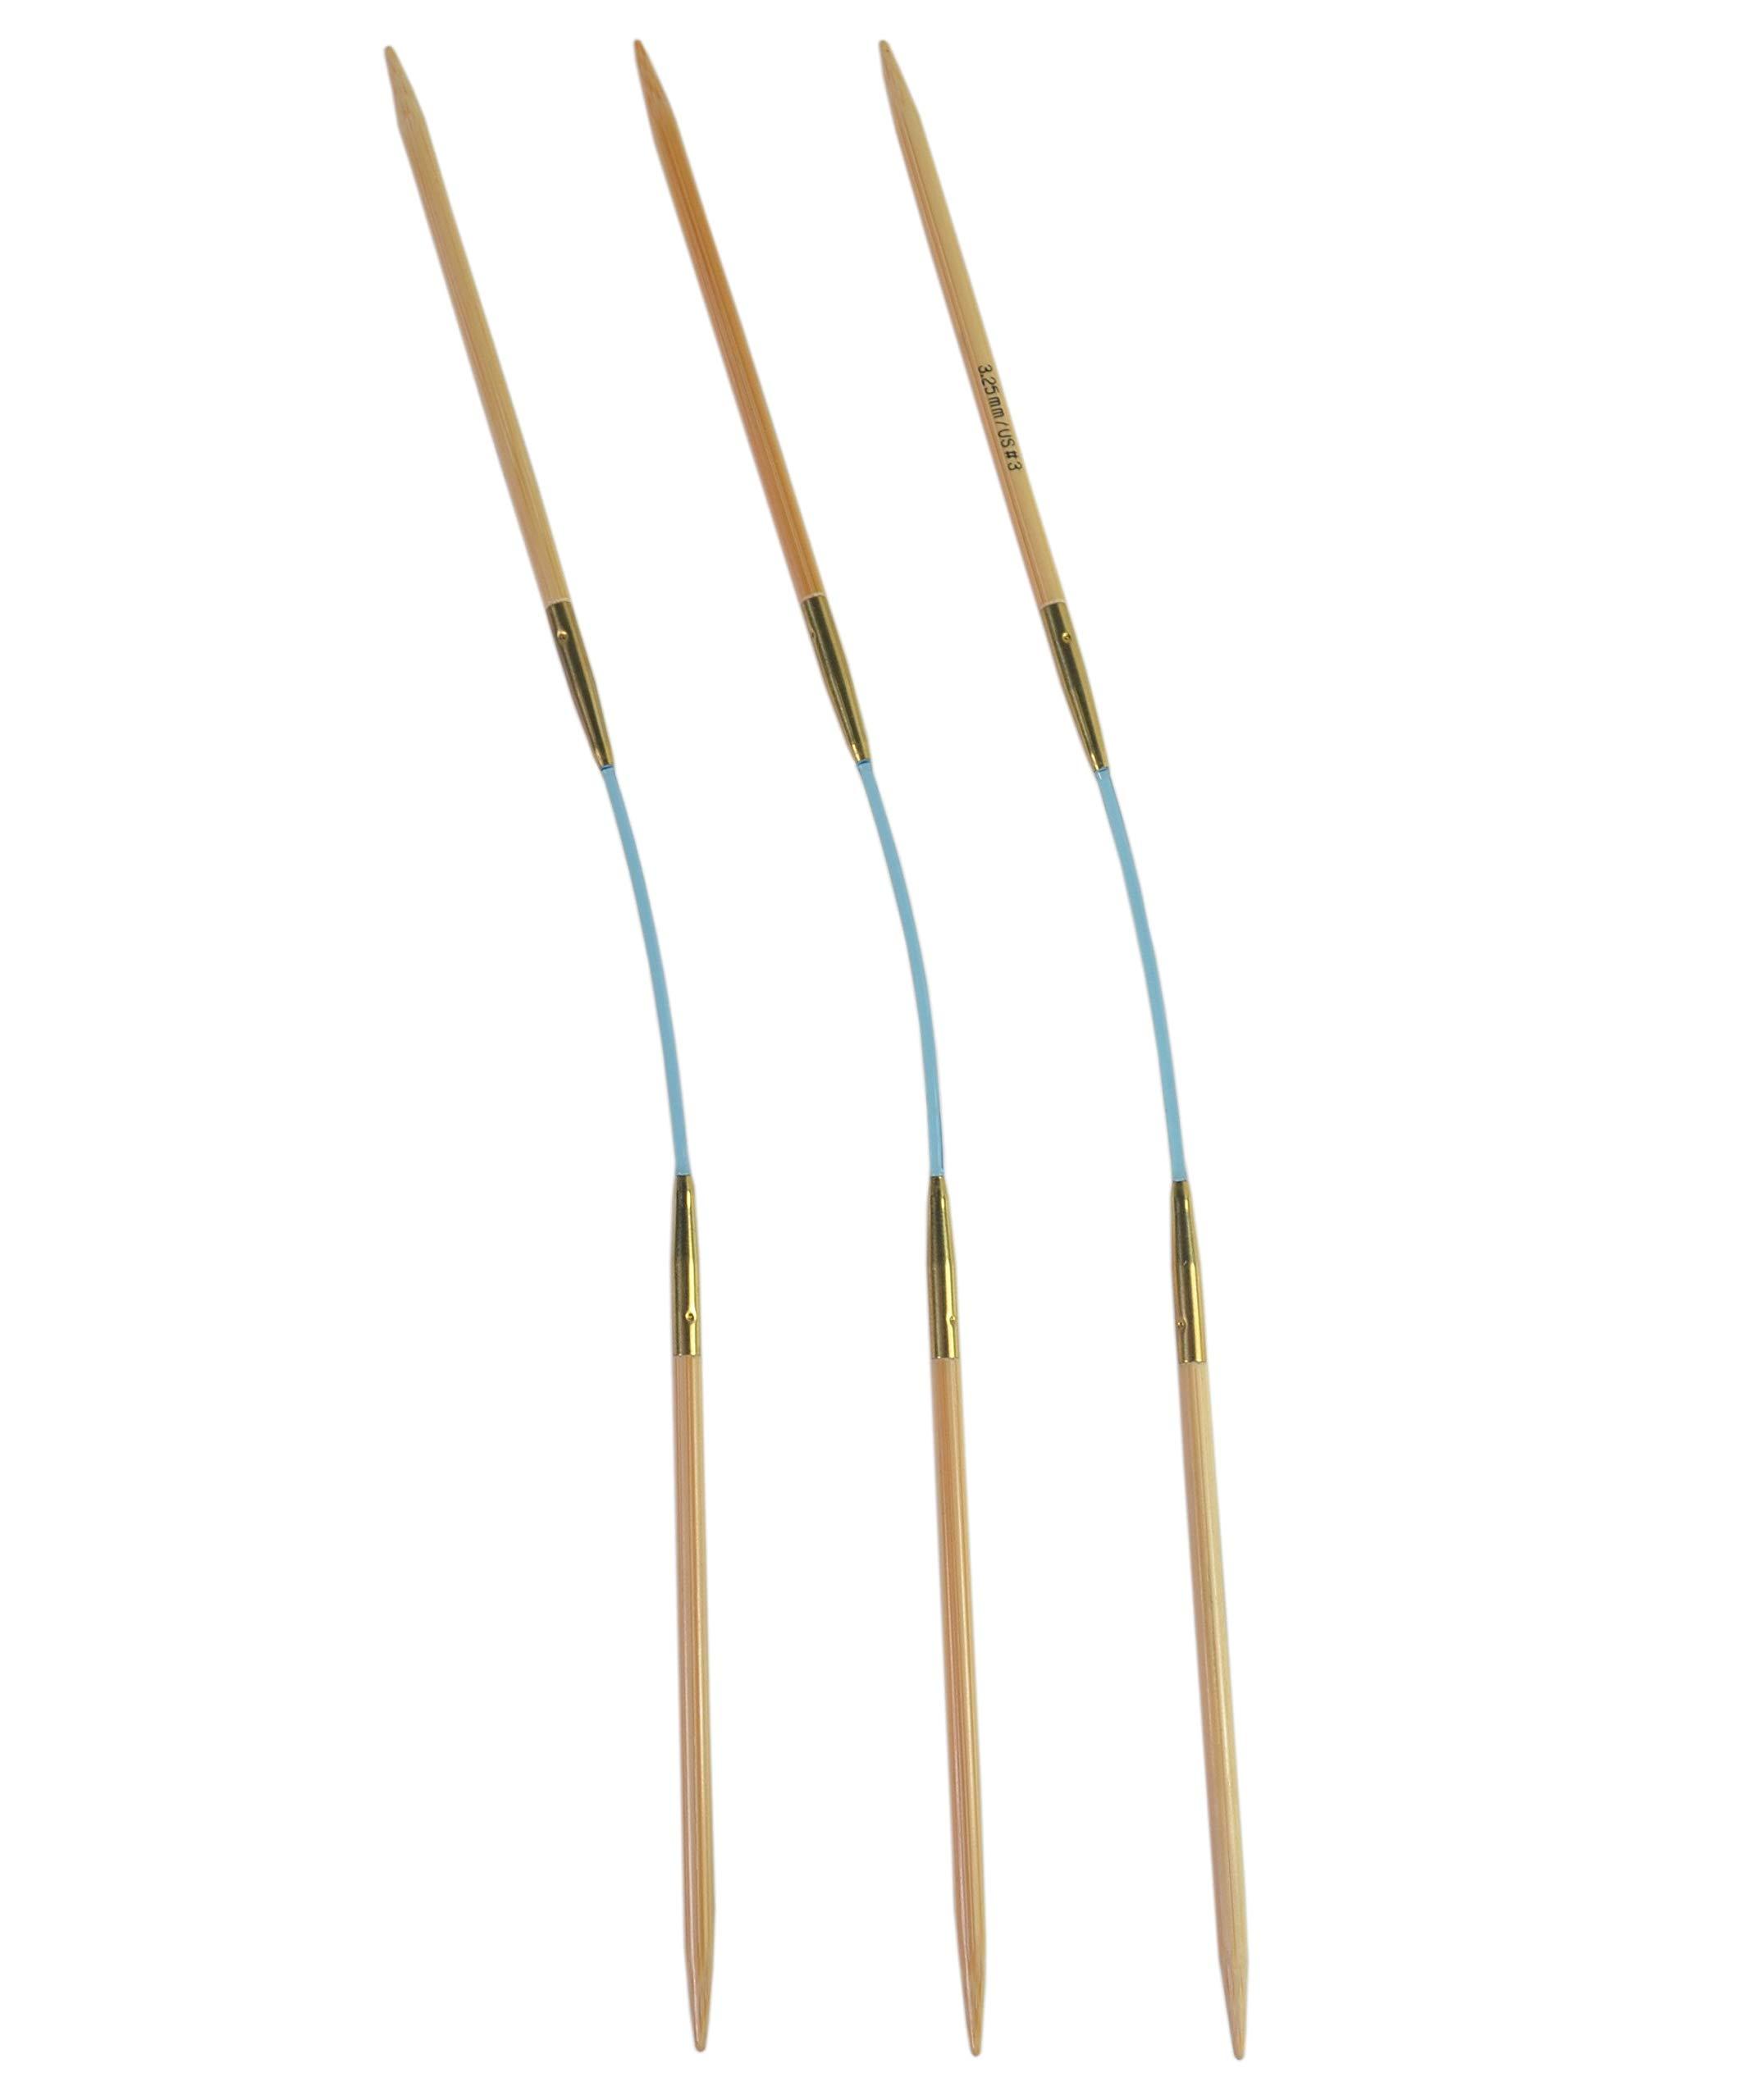 addi Flexi Flip Bamboo Knitting Needles (Set of 3) - US 2 (3.0mm)